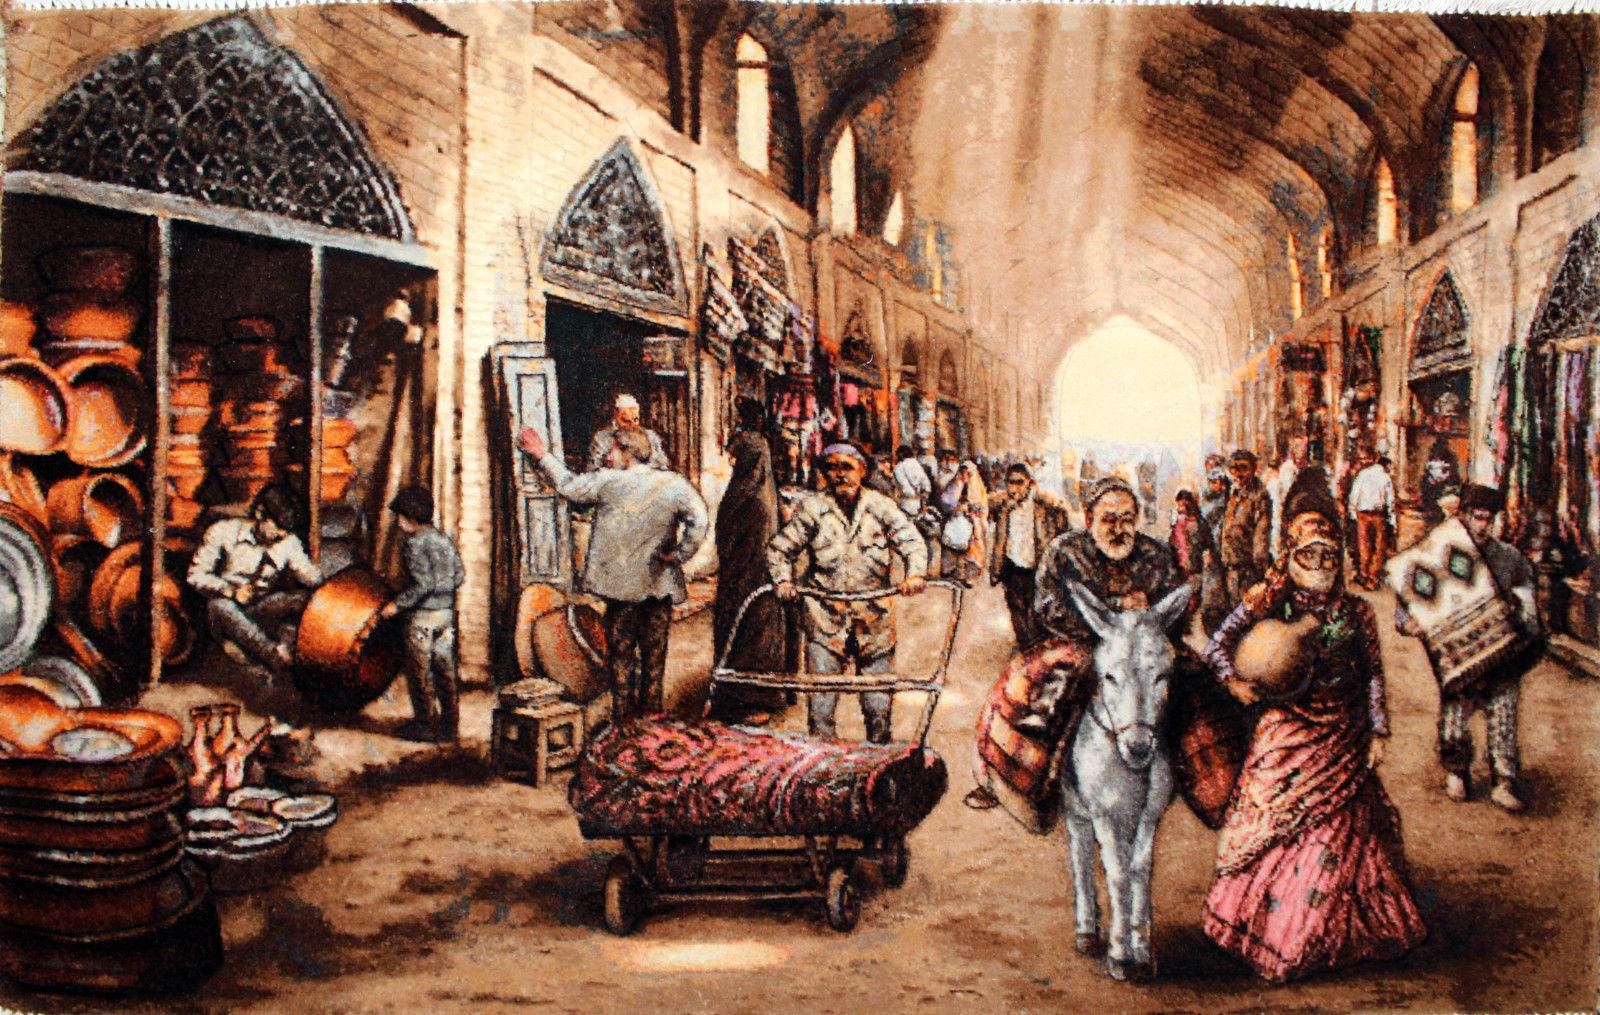 3'4″W x 2'1″H Handmade Wool and Silk MESGHARAN BAZAAR Persian Tableau Rug Tapestry Wall Hanging 12980813